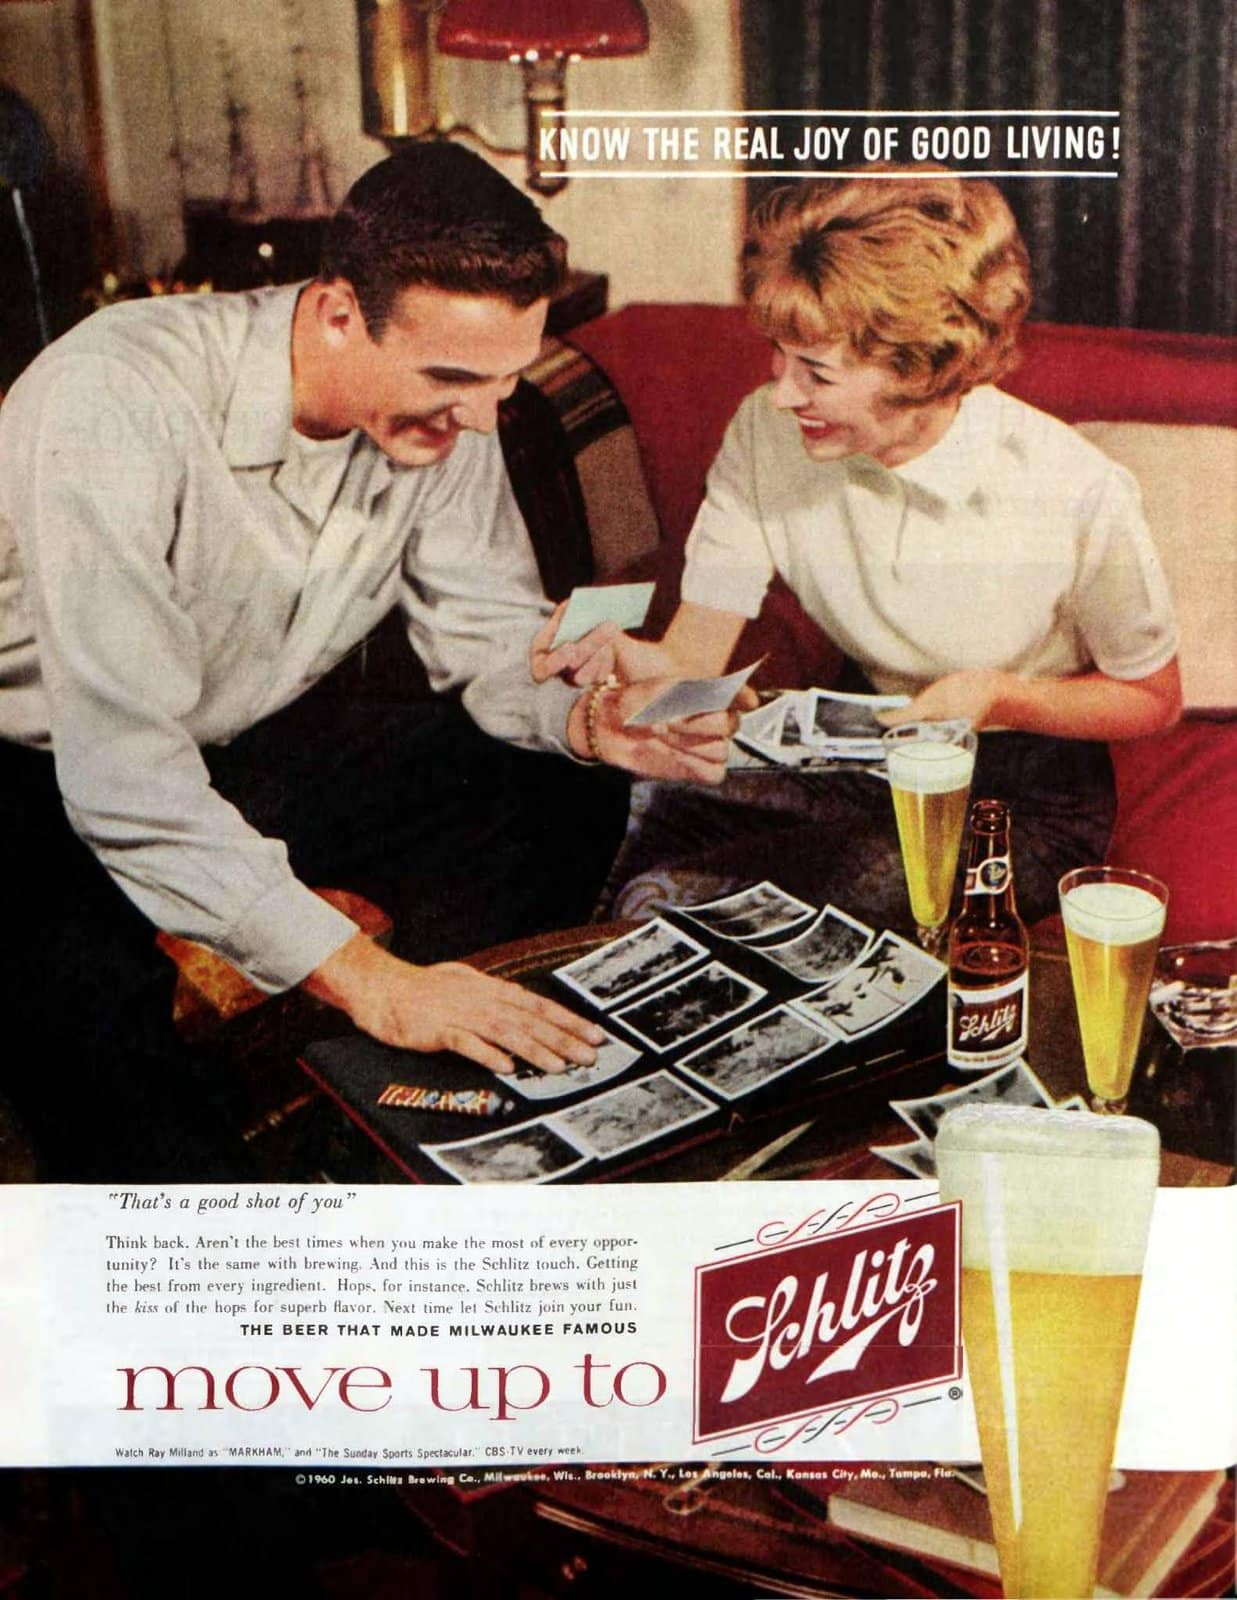 Move up to Schlitz (1960)